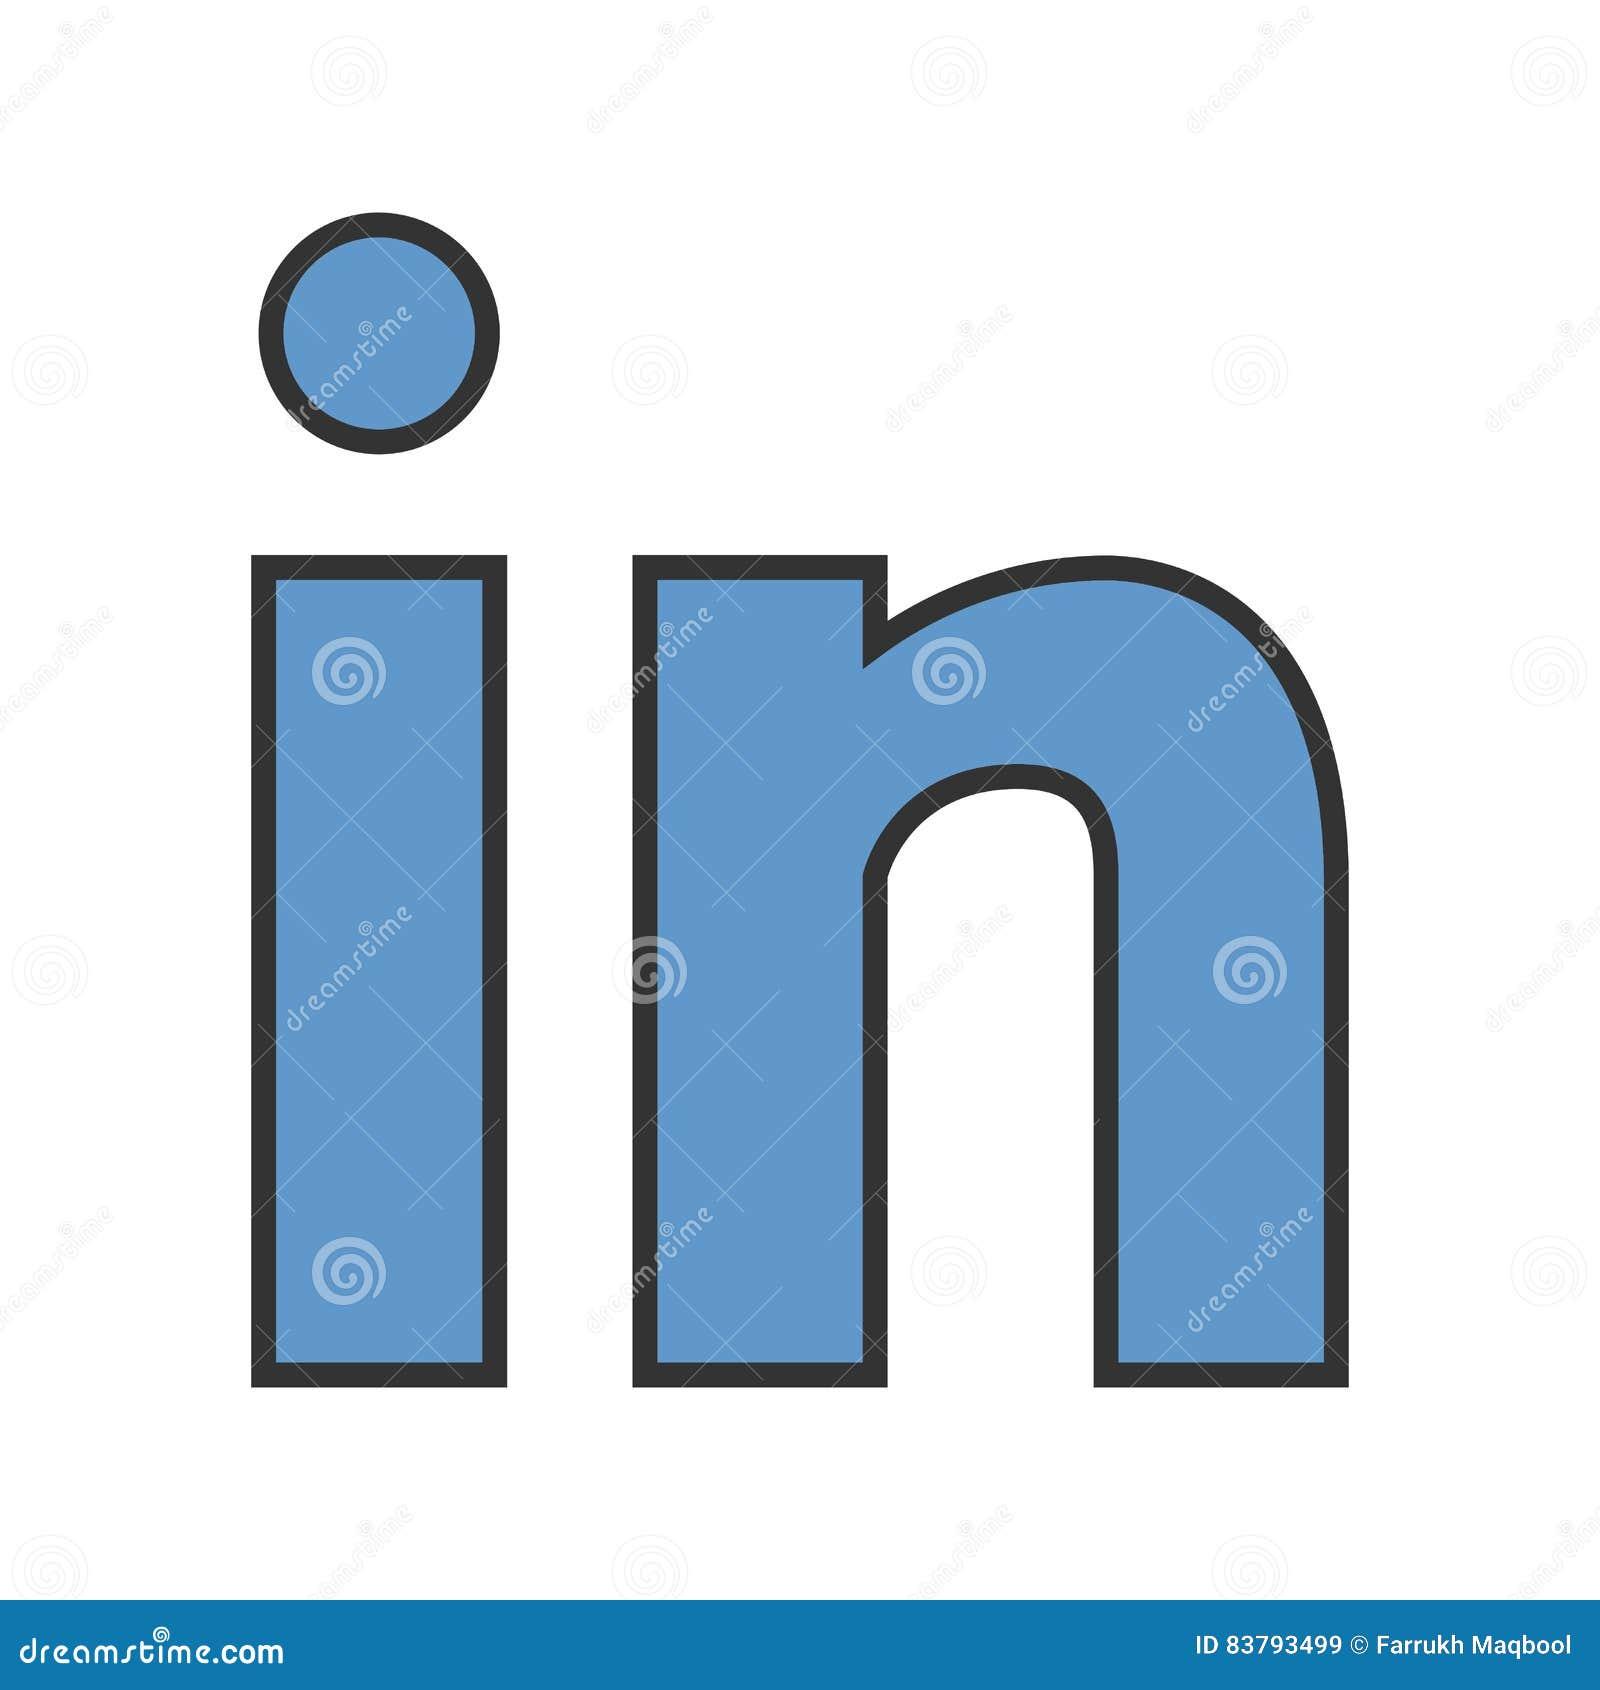 Linkedin Editorial Stock Image Illustration Of Linkedin 83793499